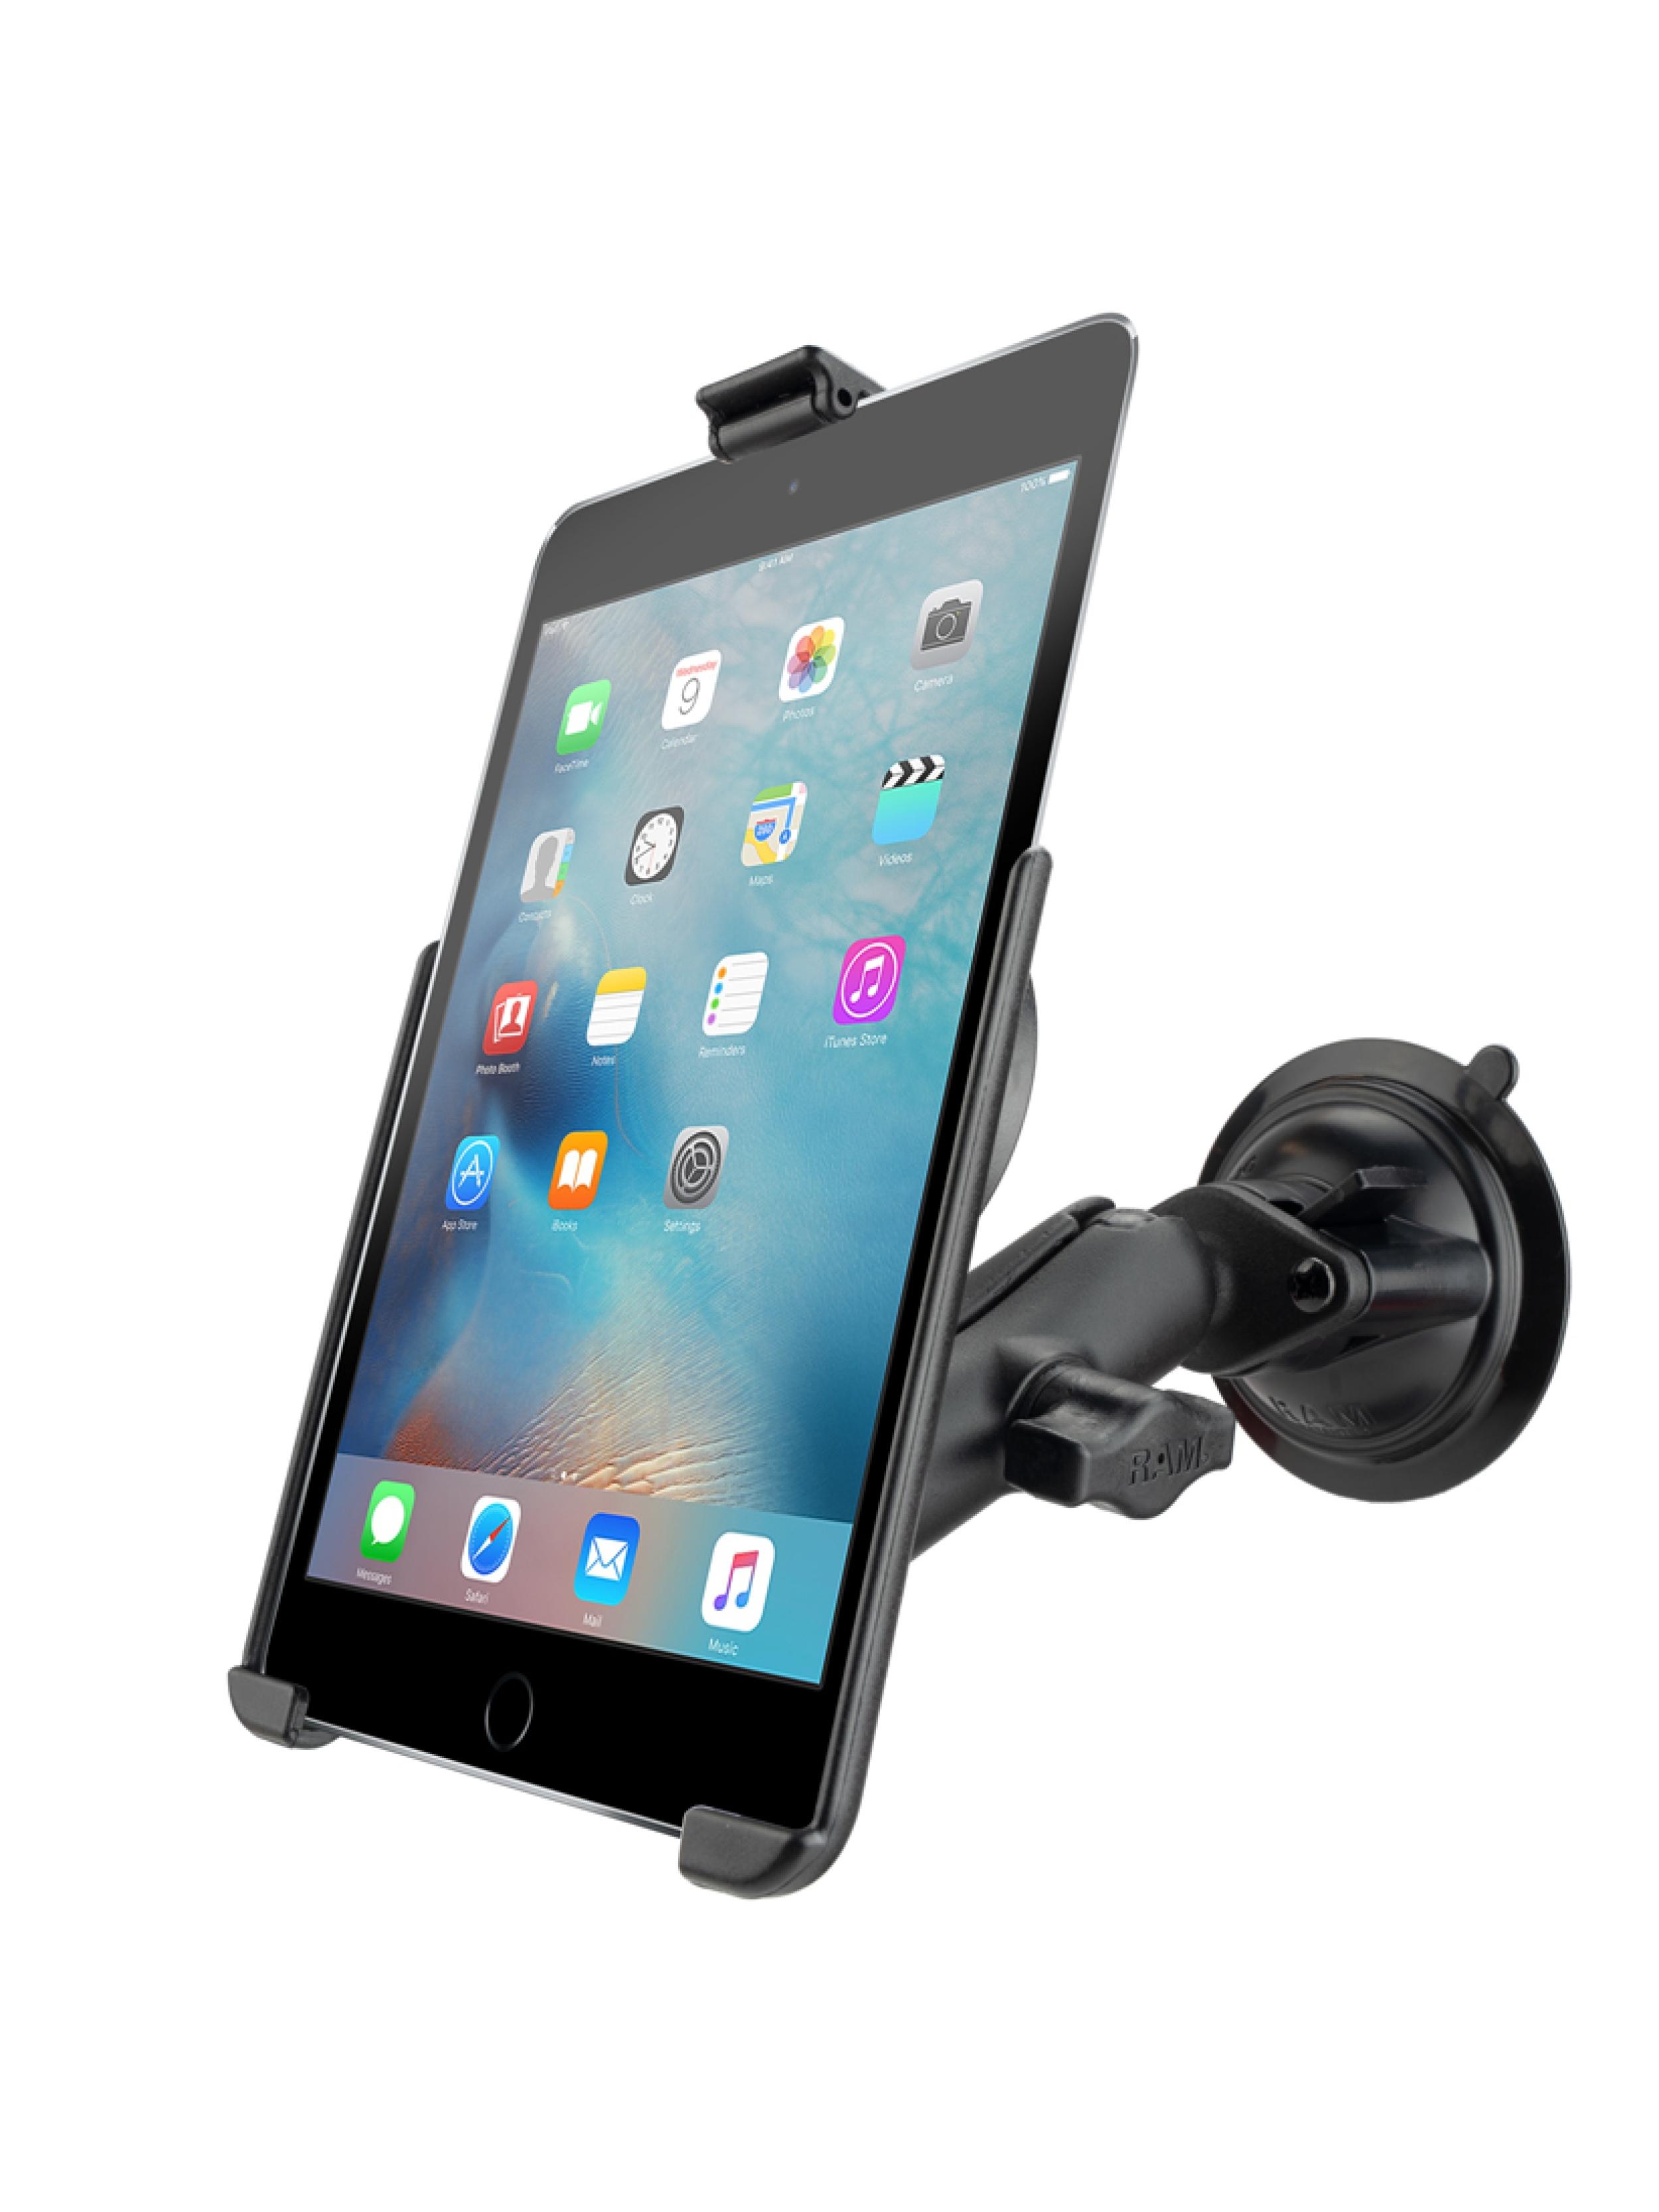 RAM Mounts Saugfuss-Halterung Apple iPad mini 4/5 - B-Kugel (1 Zoll), mittlerer Verbindungsarm